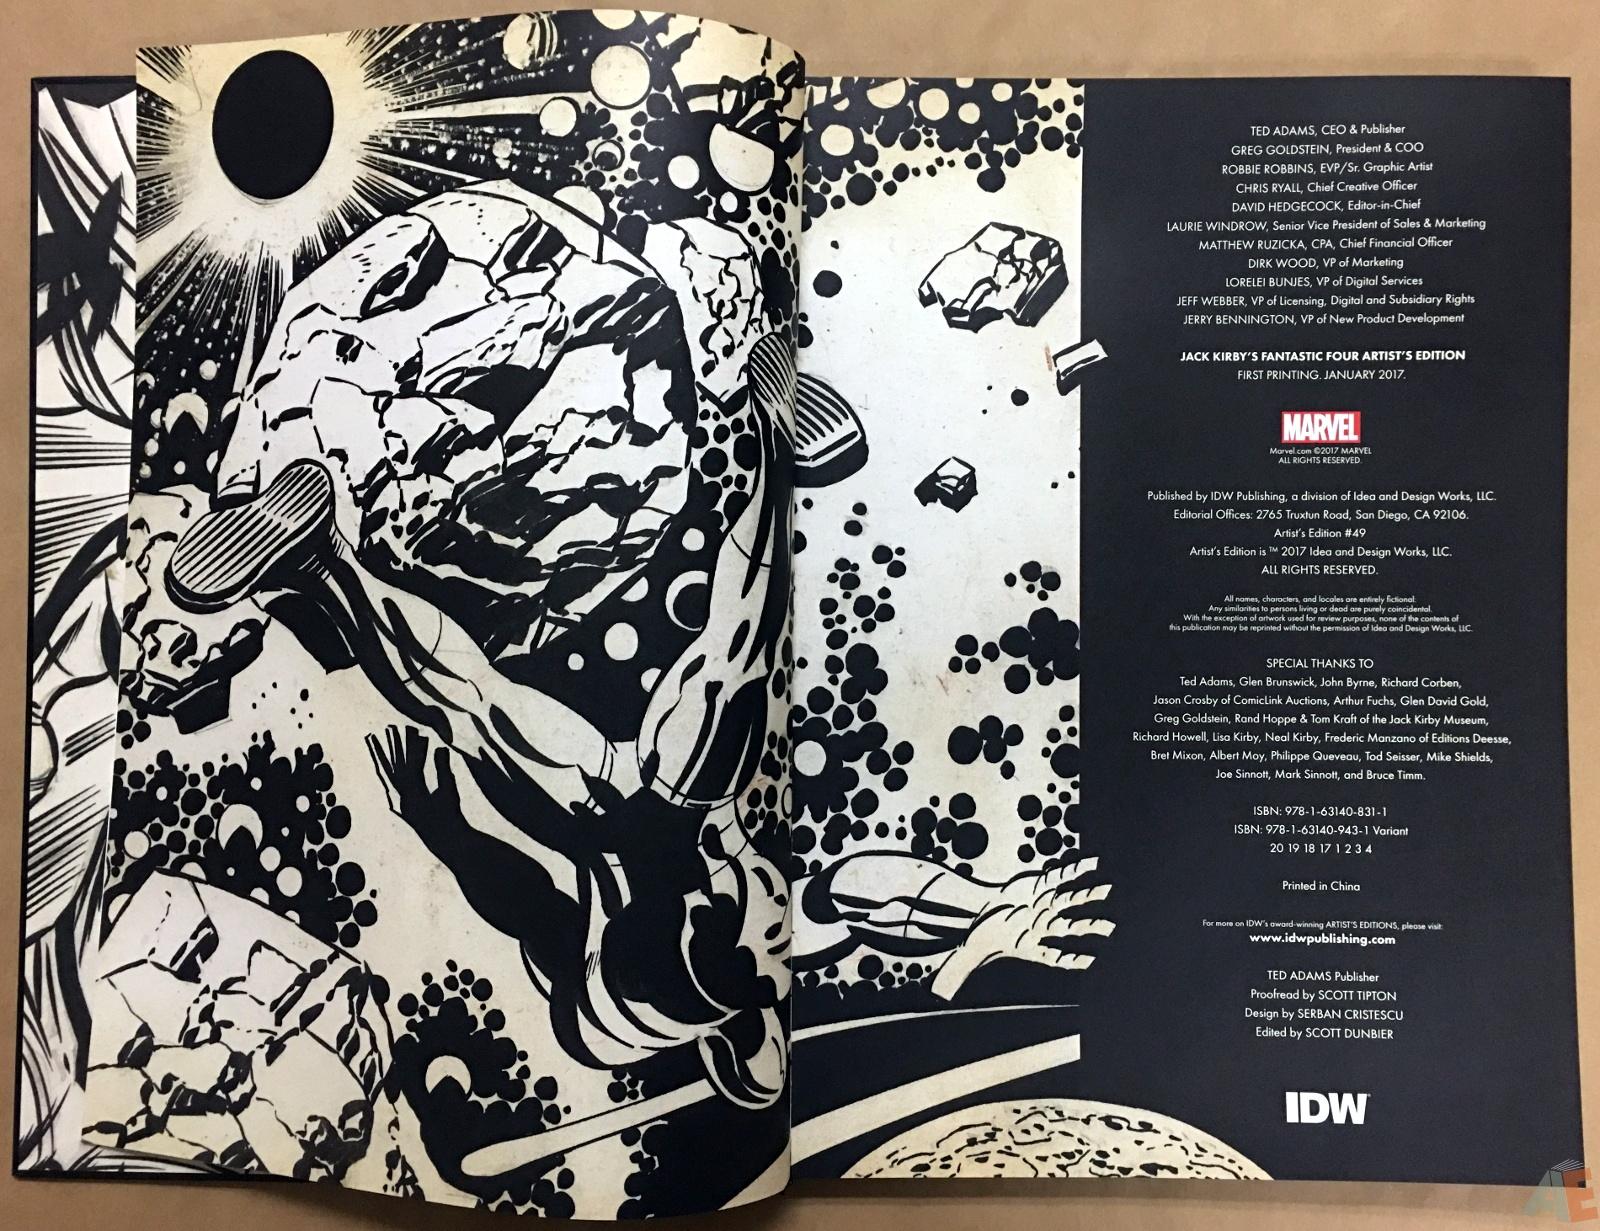 Jack Kirby's Fantastic Four Artist's Edition 4